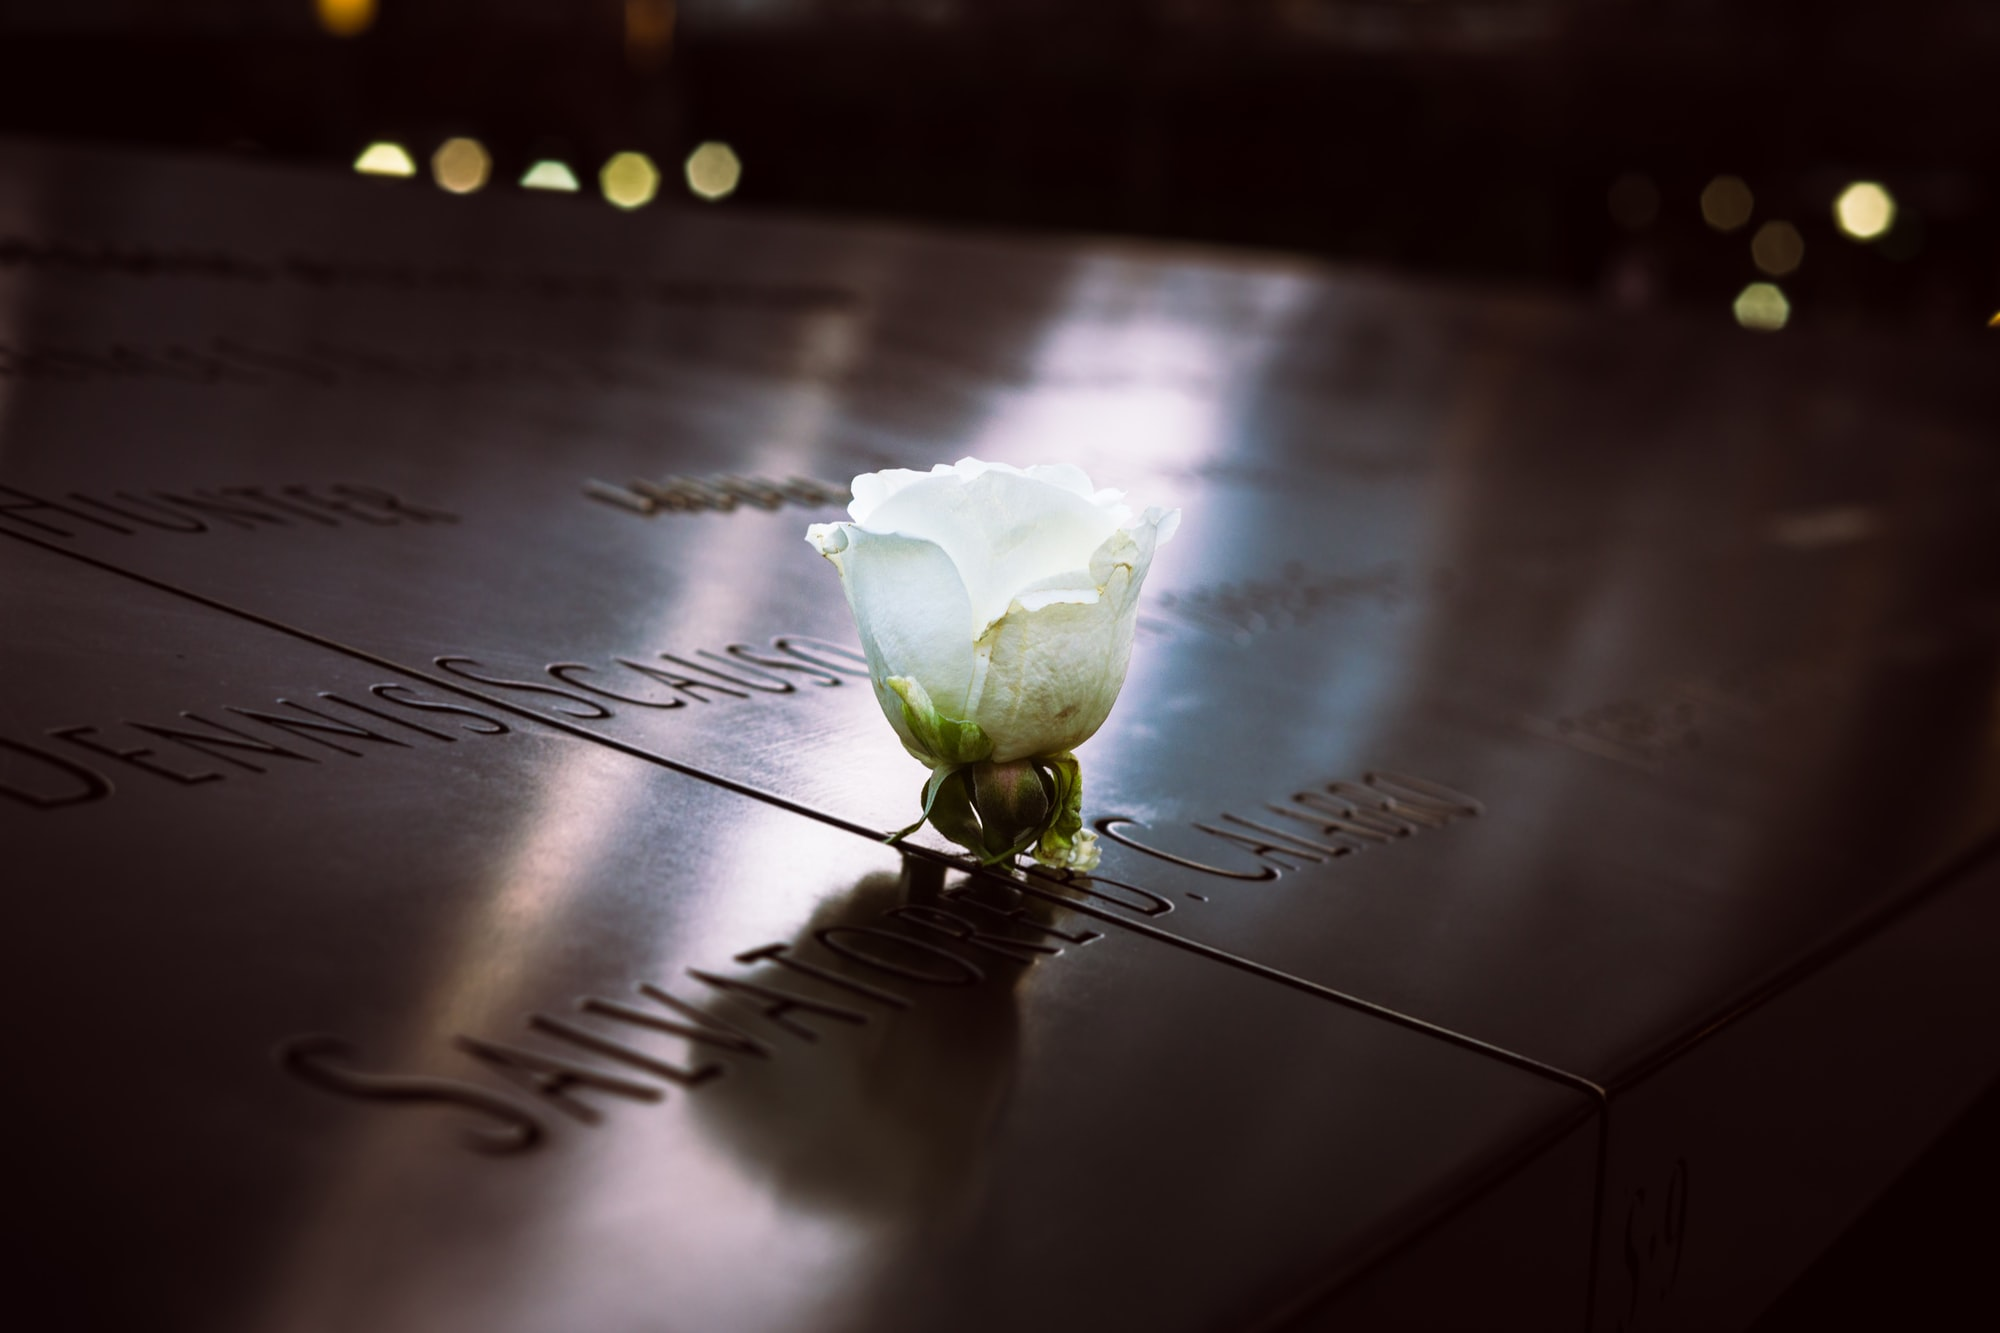 9/11 Memorial // Roses don't take away the pain